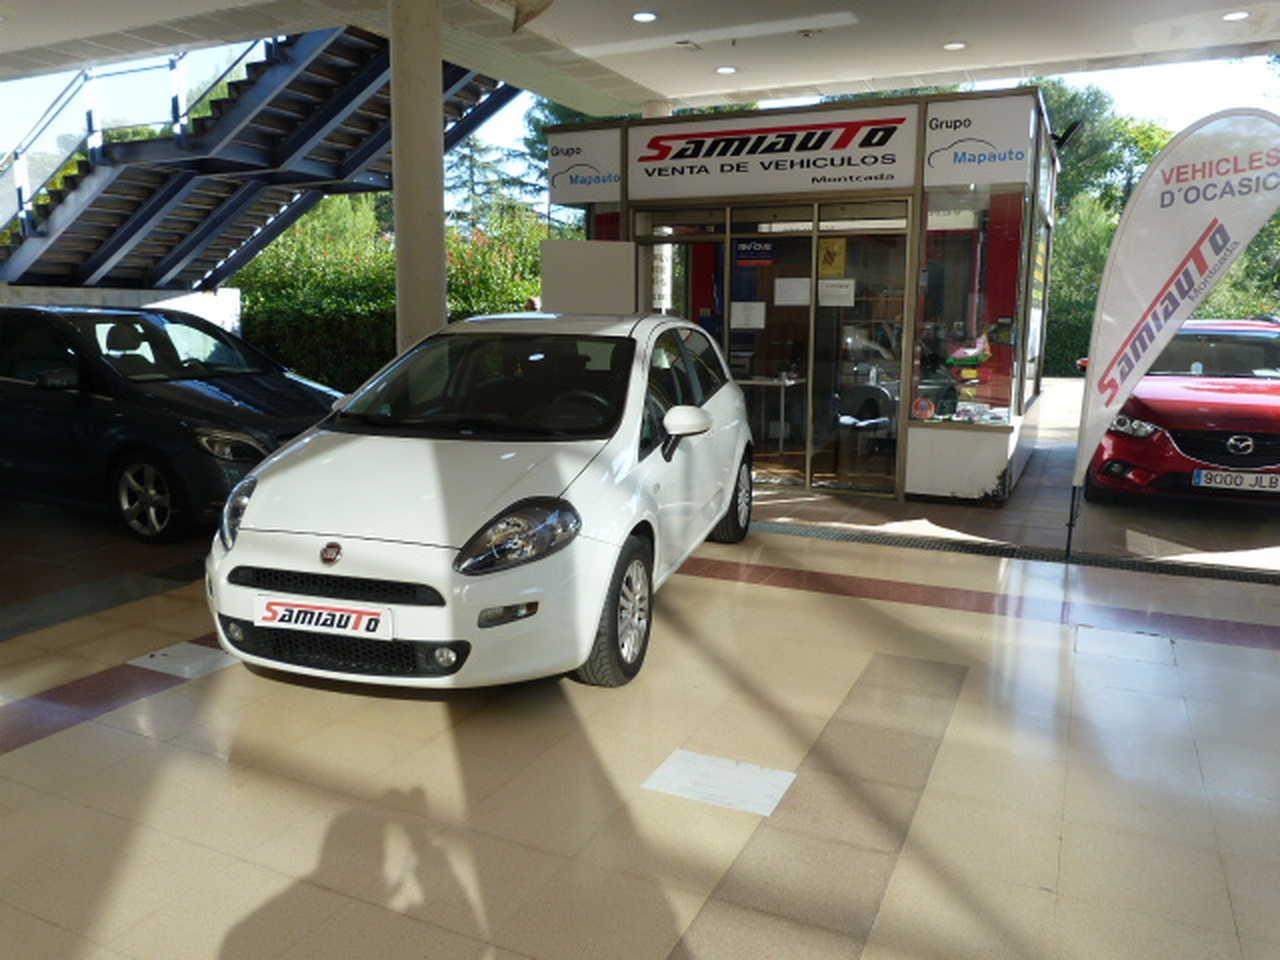 Fiat Punto   Punto 1.2 8v Easy 69 CV SS Gasolina 5p  muy muy bien cuidado  - Foto 1